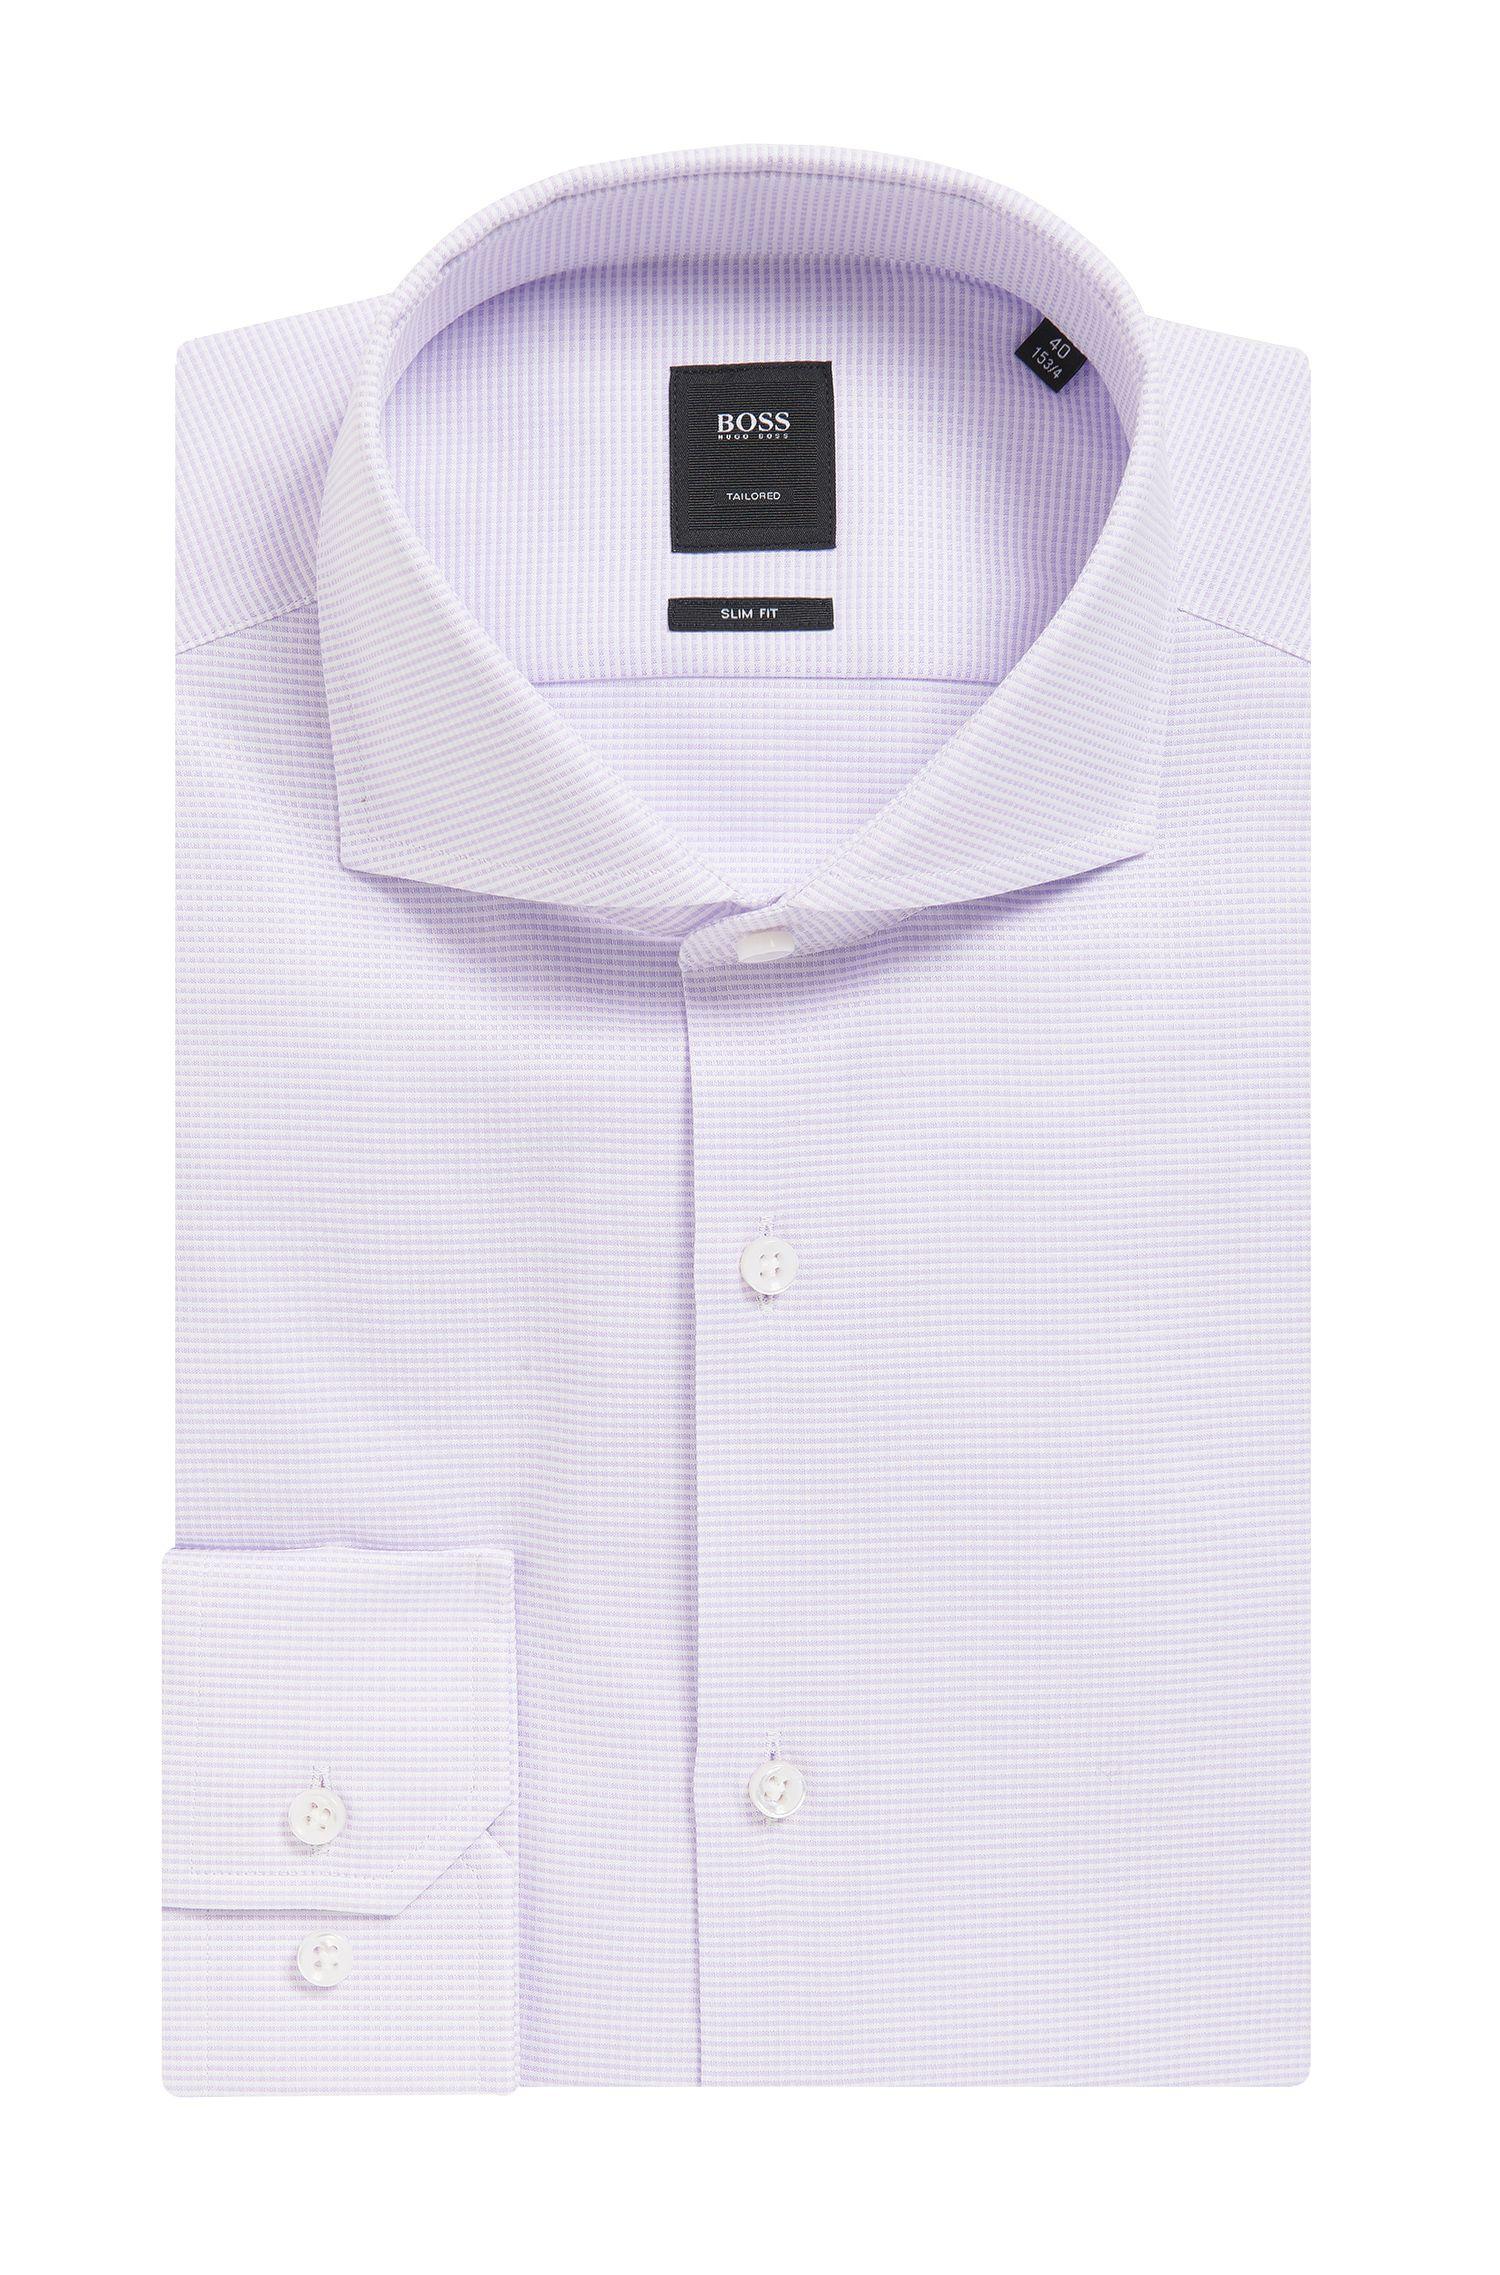 'T-Christo' | Slim Fit, Mini-Check Cotton Dress Shirt